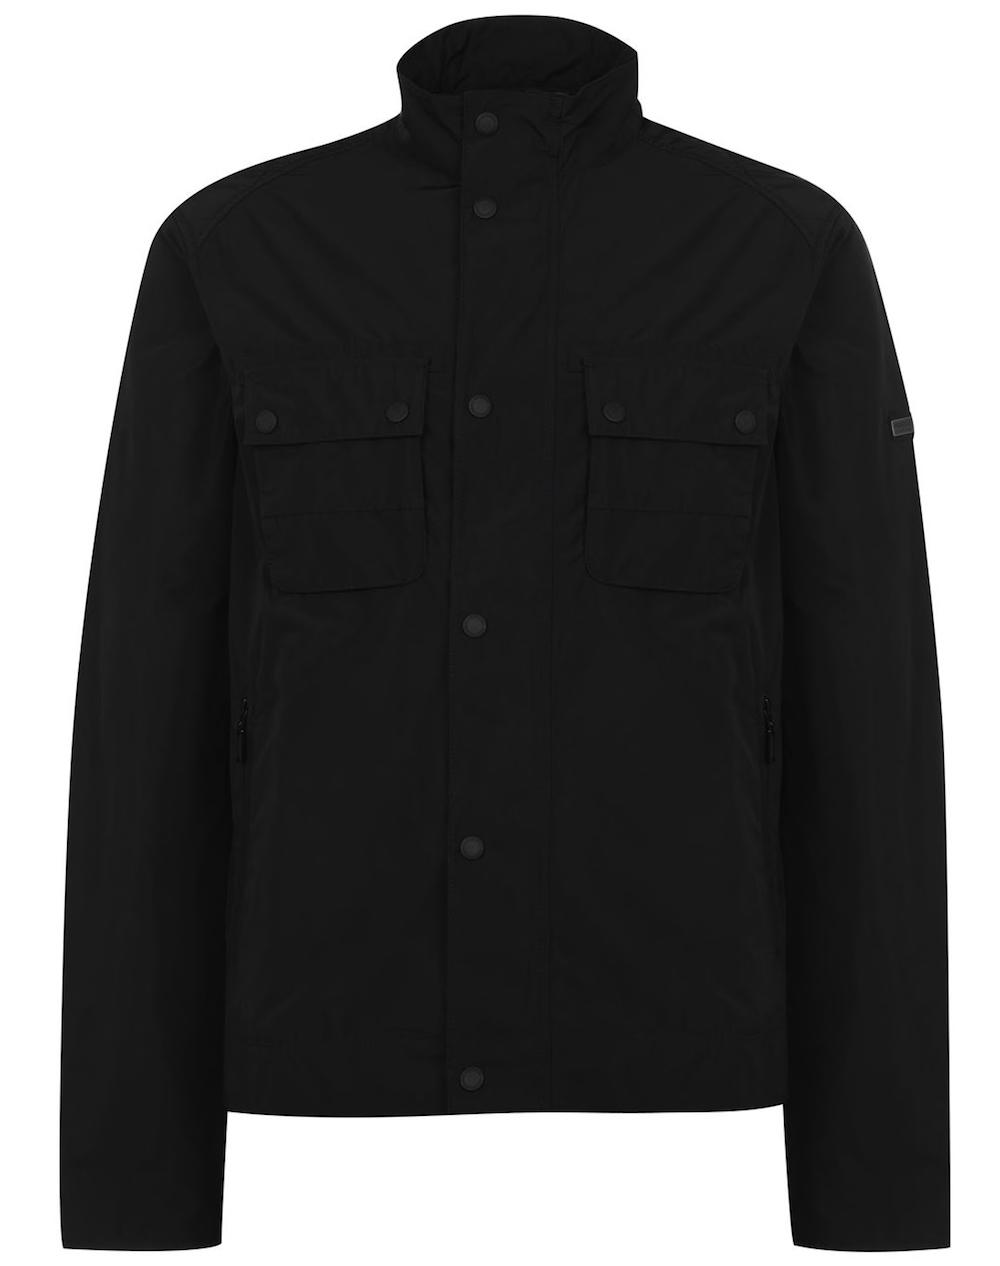 Stannington Casual Jacket